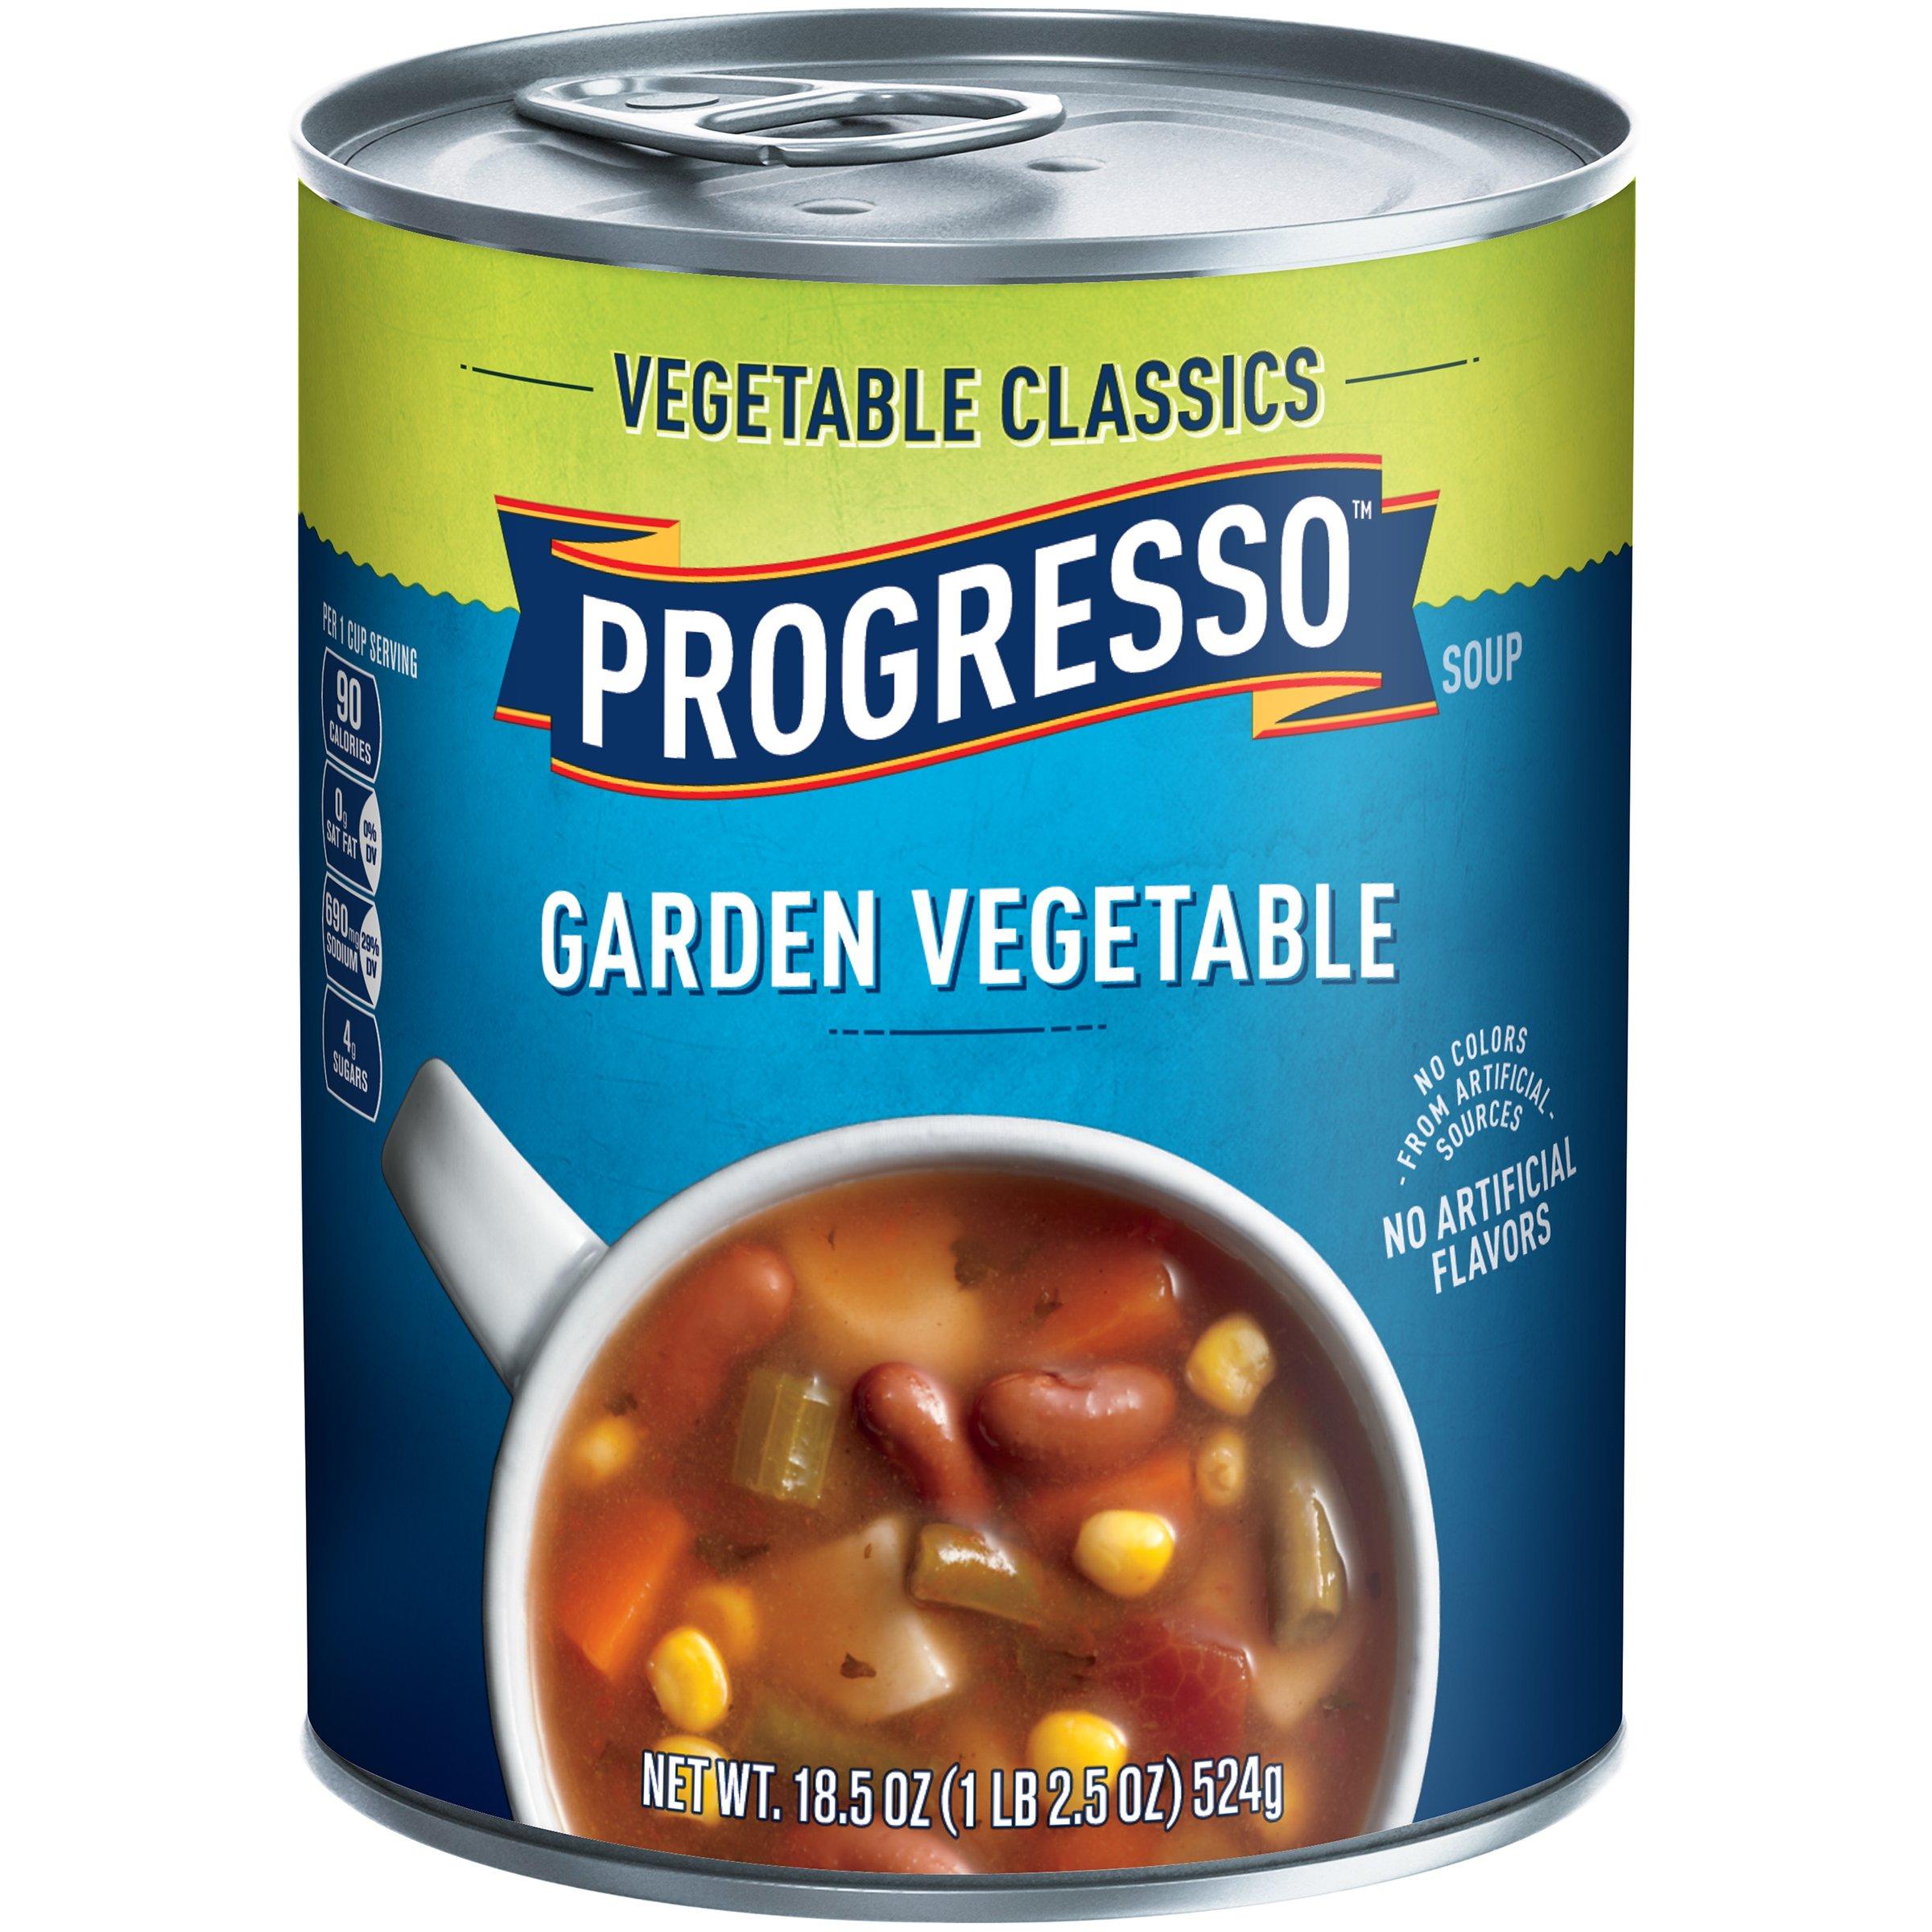 Progresso Soup, Vegetable Classics, Garden Vegetable Soup, Gluten Free, 18.5 oz Can